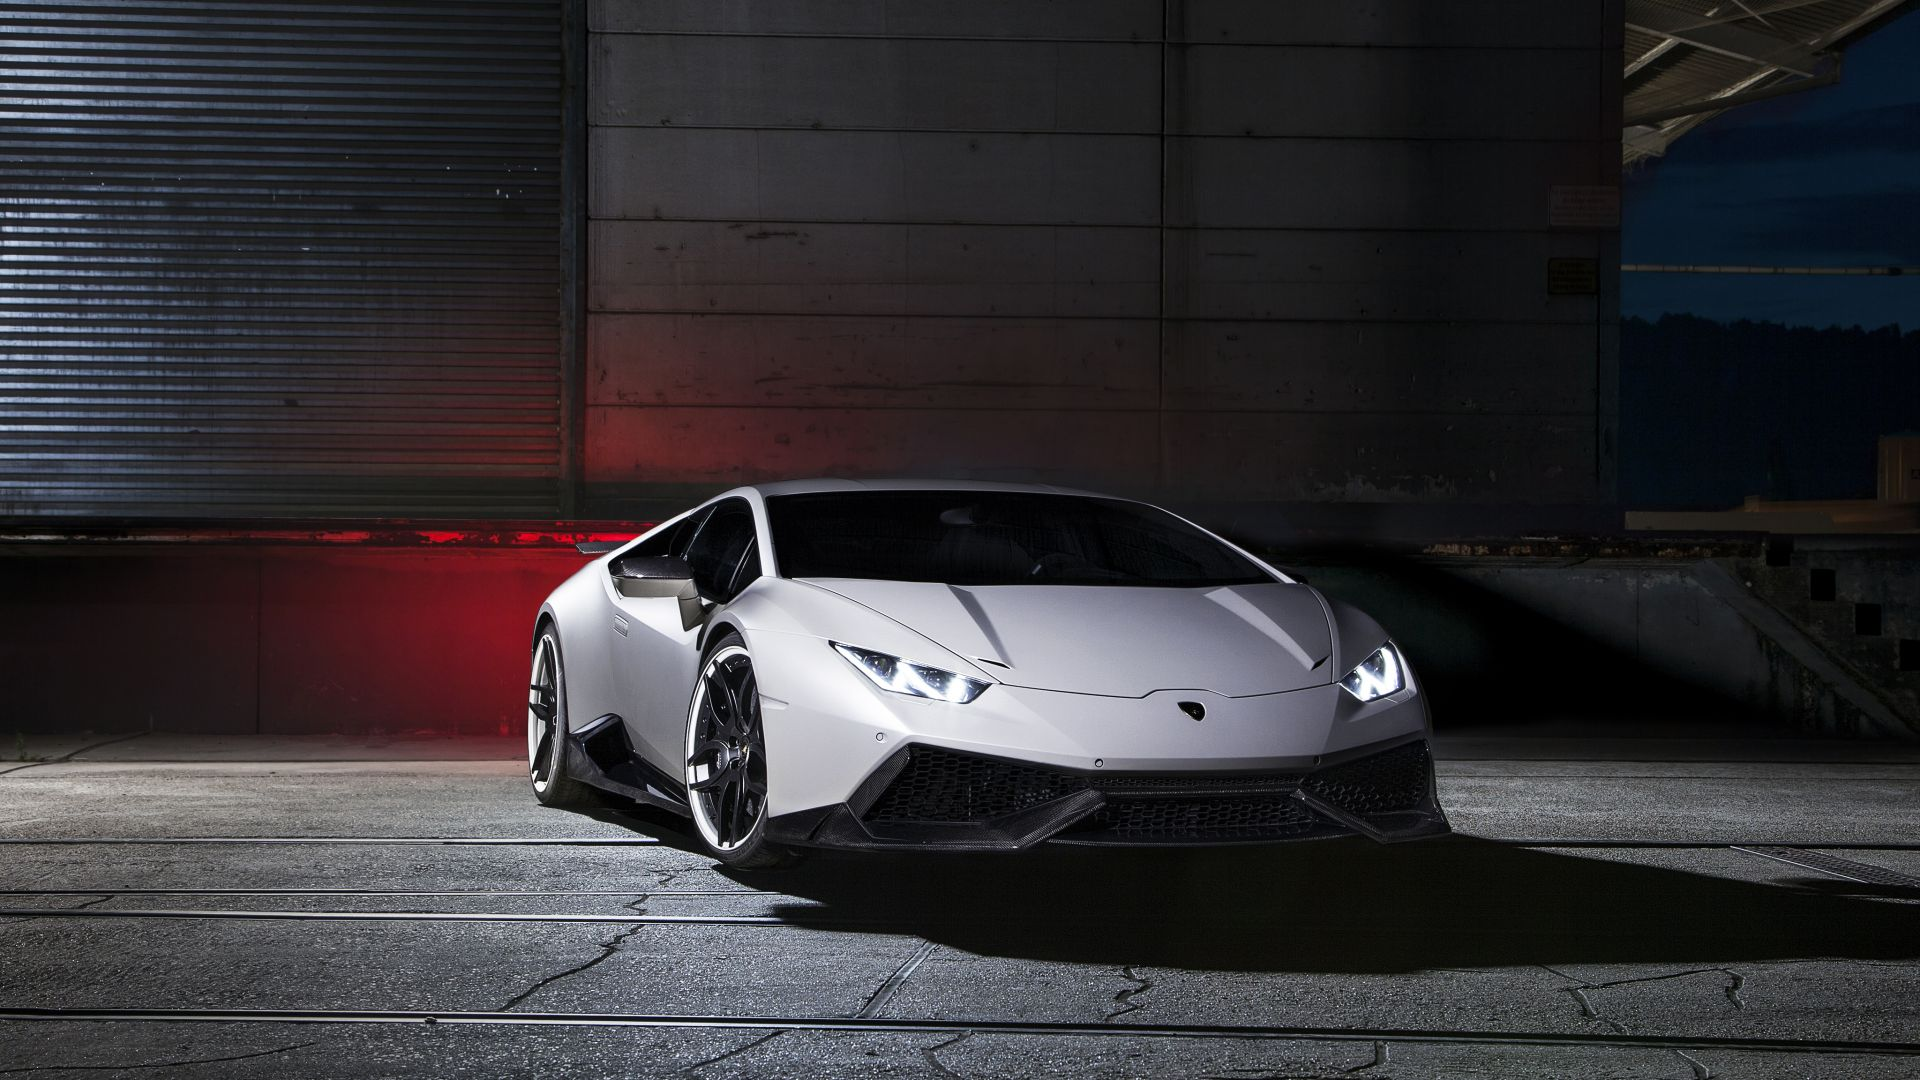 wallpaper lamborghini huracan lp610 4 supercar white luxury cars sports car test drive. Black Bedroom Furniture Sets. Home Design Ideas